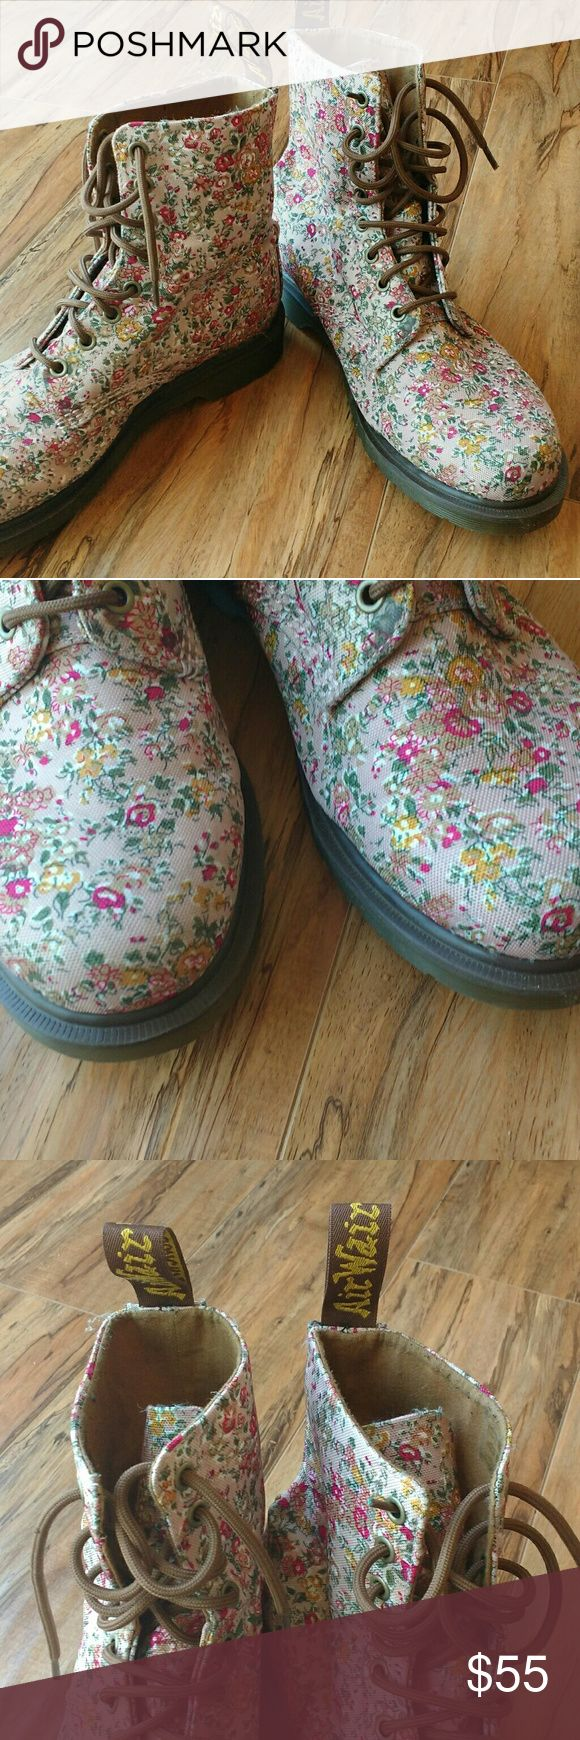 DR Marten's floral combat boots Dr Marten's combat boots. Floral, bouncing air cushion sole. Very good condition. No flaws. Dr. Martens Shoes Combat & Moto Boots